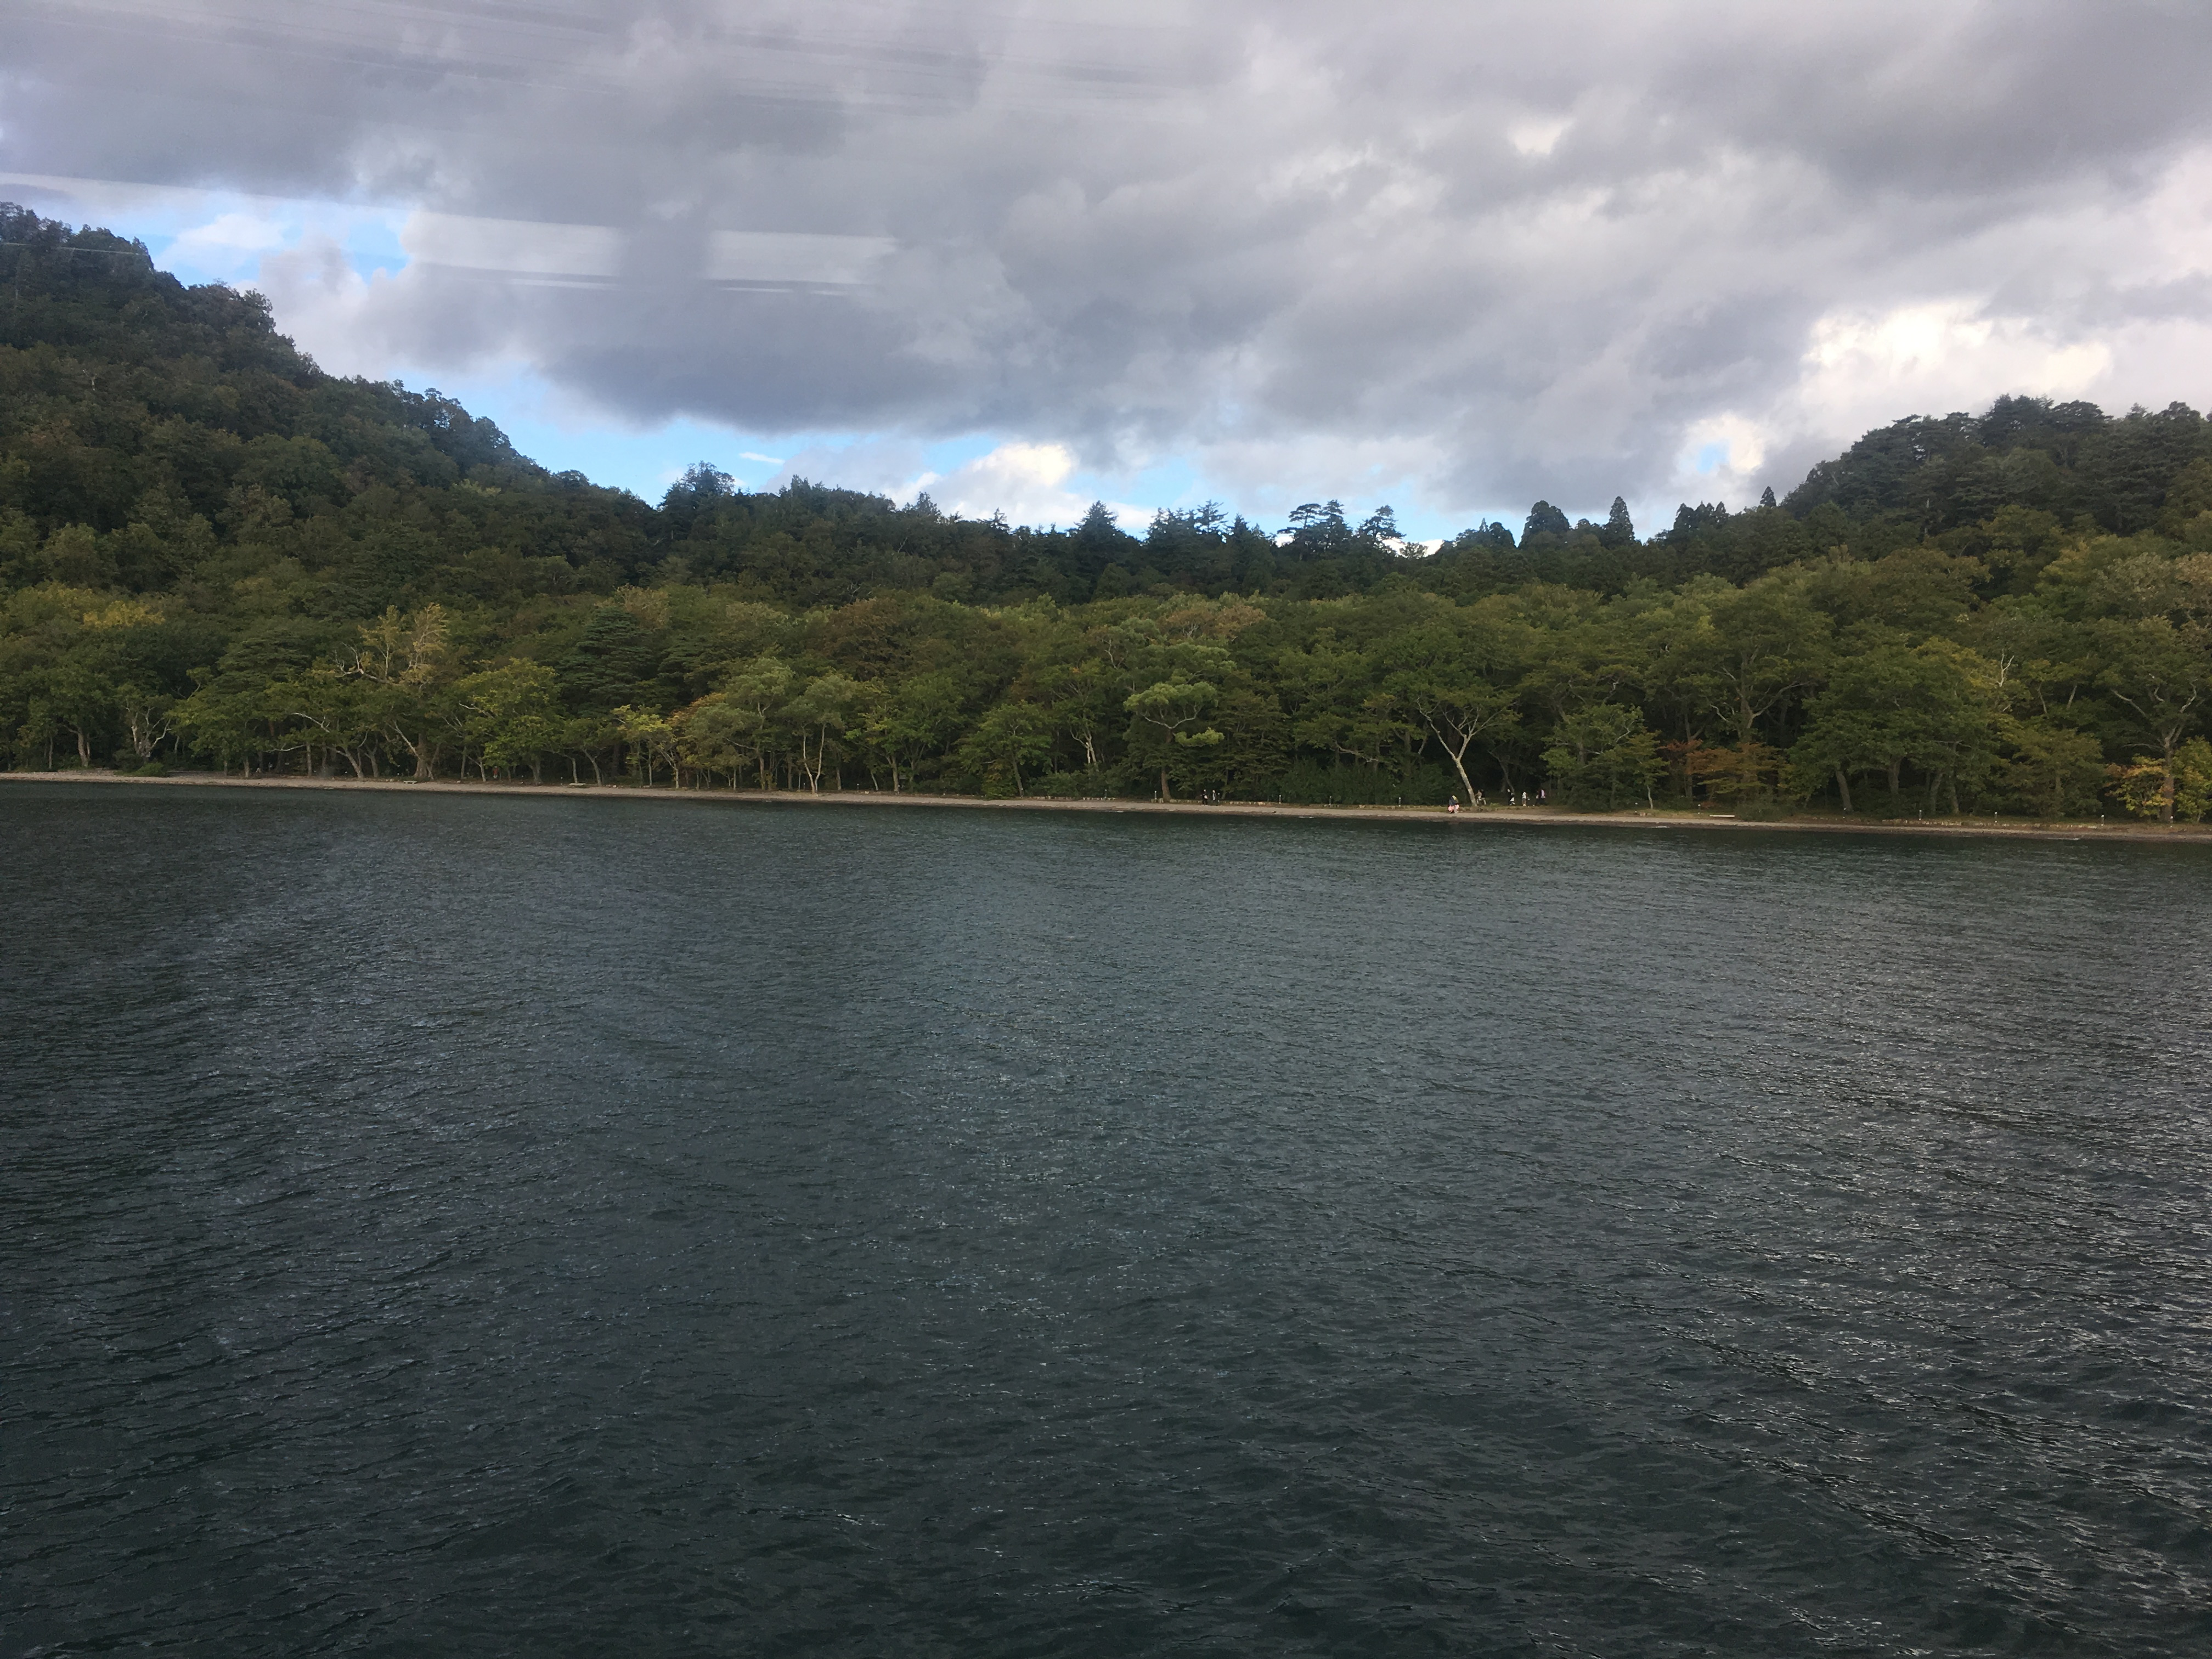 十和田湖遊覧船船首から十和田神社湖畔